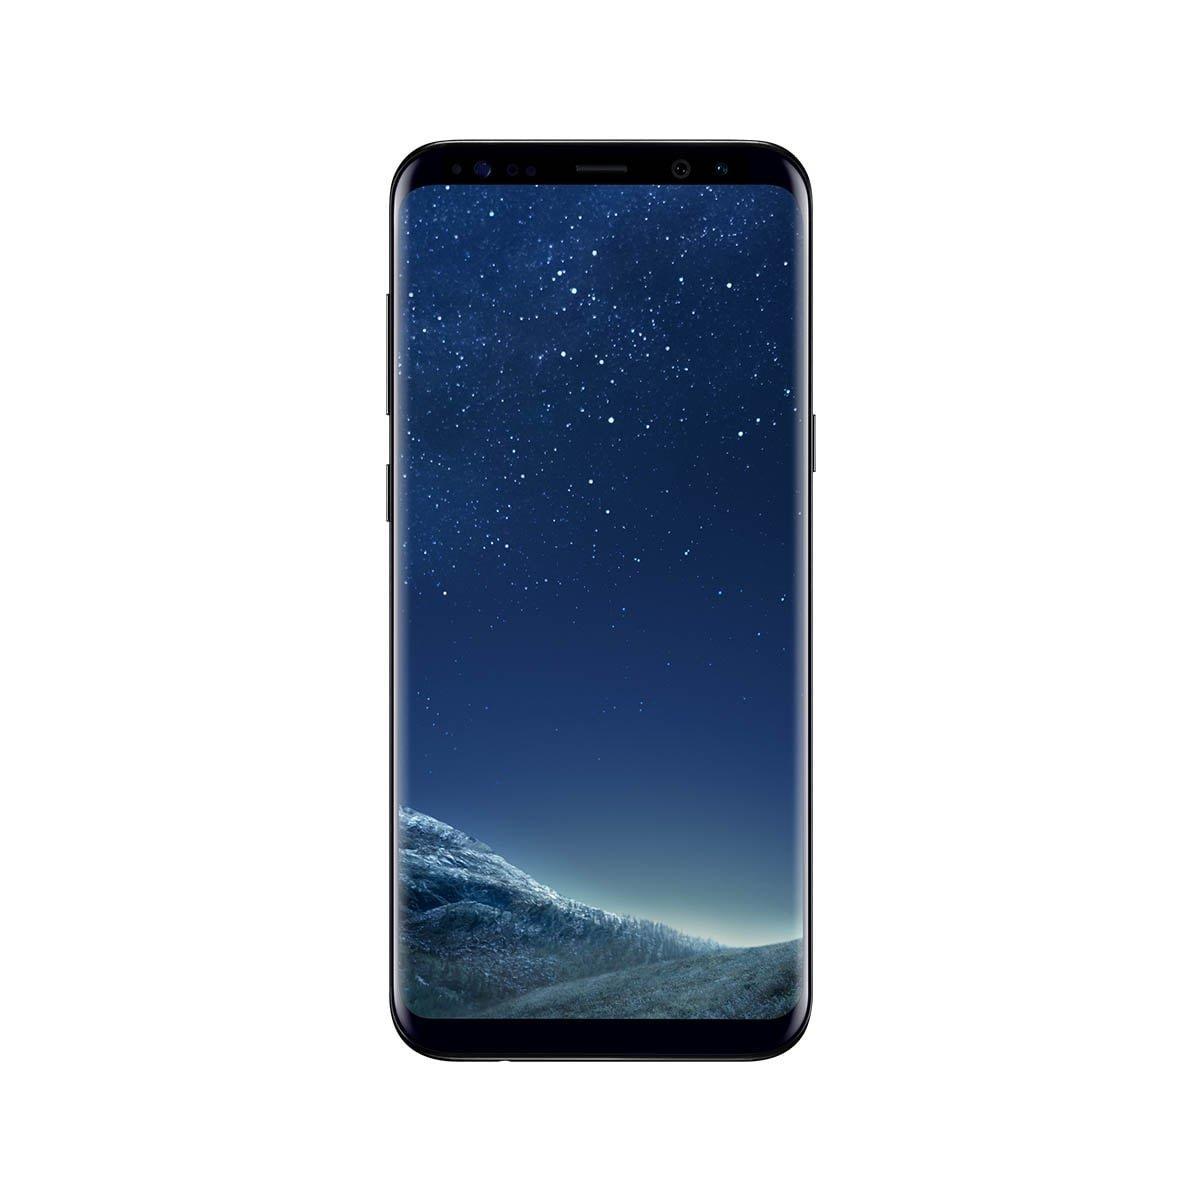 Samsung Galaxy S8 5.8 imagen